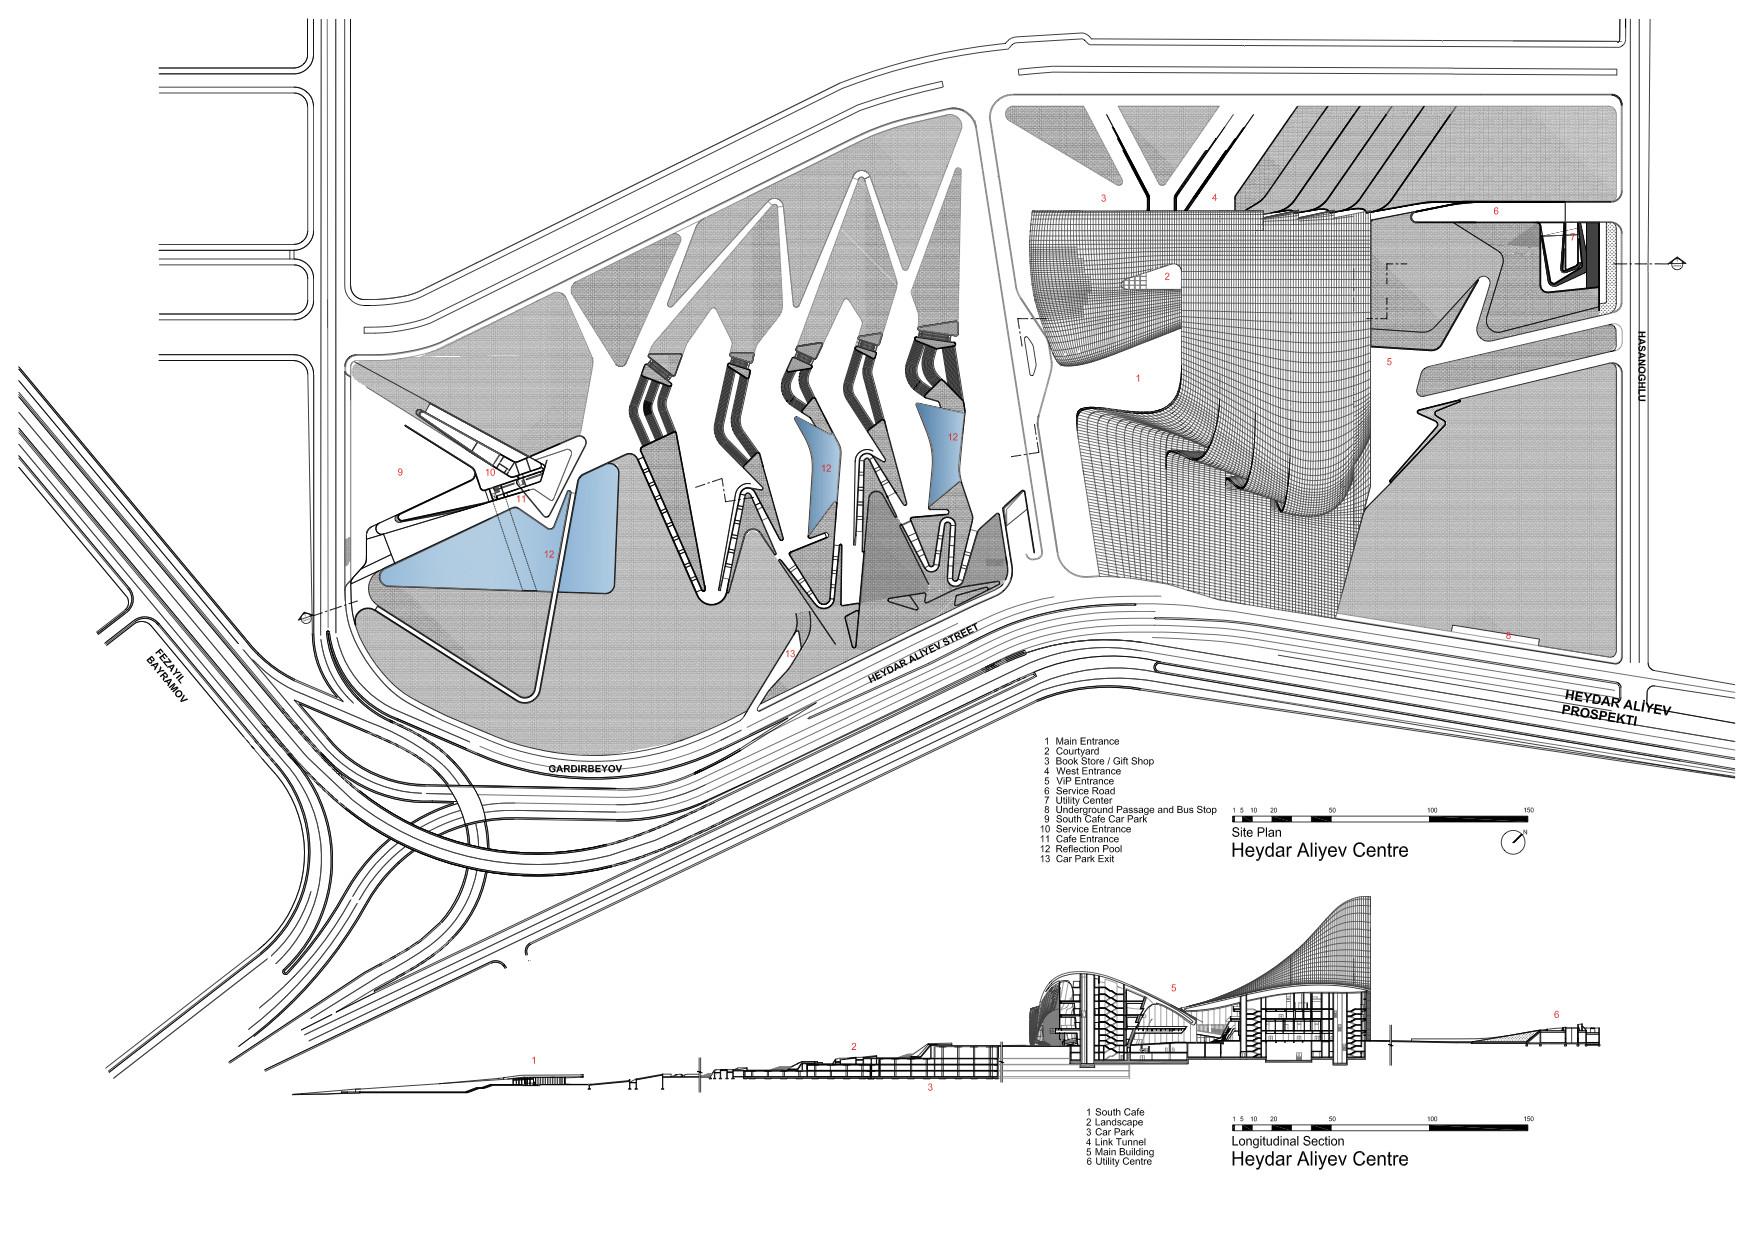 5285282ae8e44e222500015a Heydar Aliyev Center Zaha Hadid Architects Site Plan Plus Section on Katsura Imperial Villa Plan View